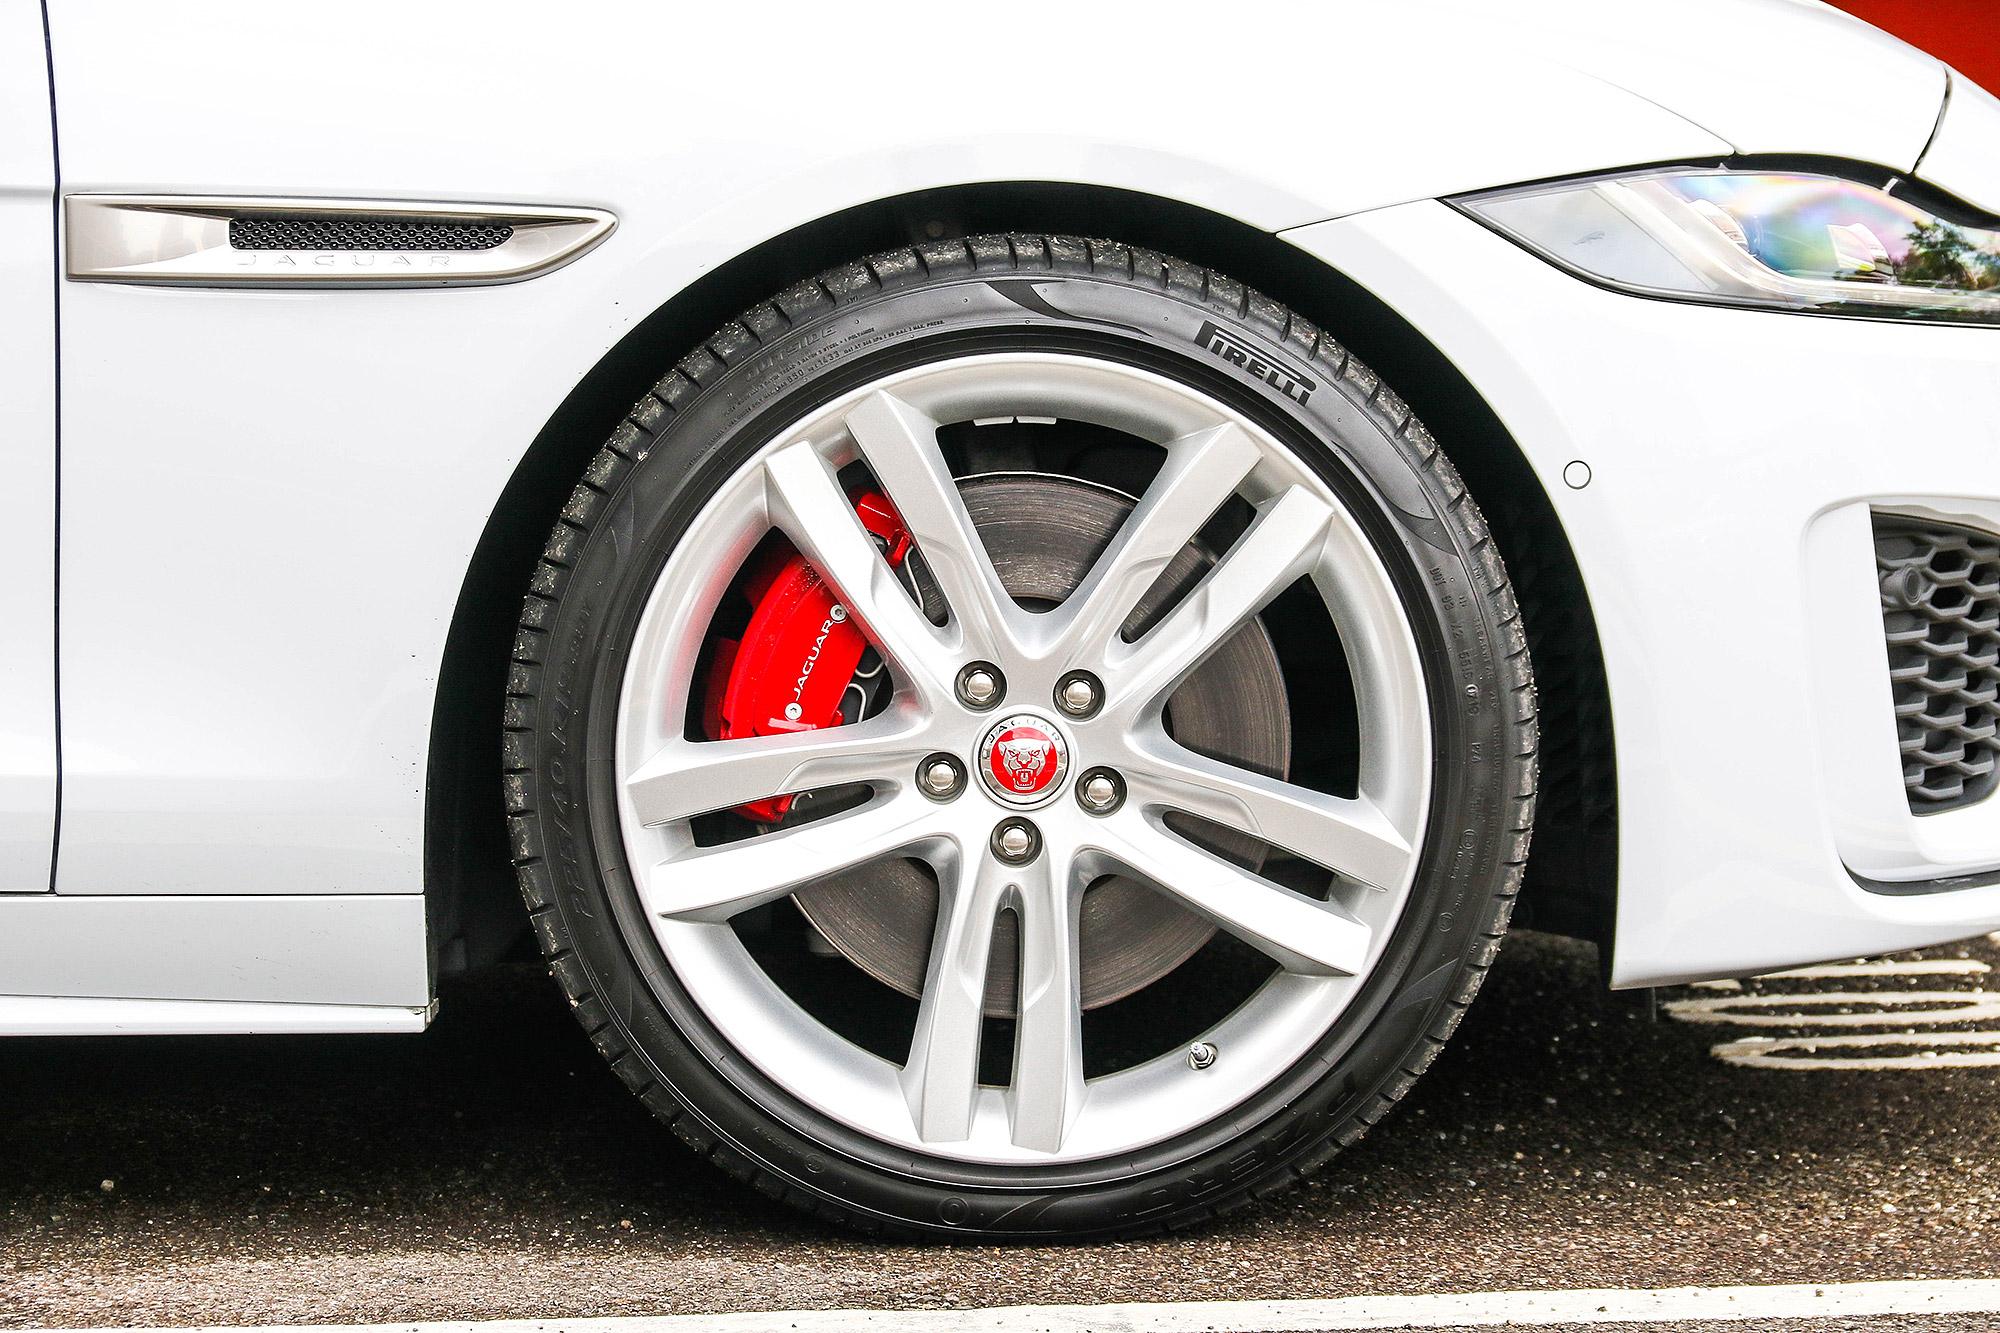 P300 動力車型標配 19 吋鋁合金輪圈。